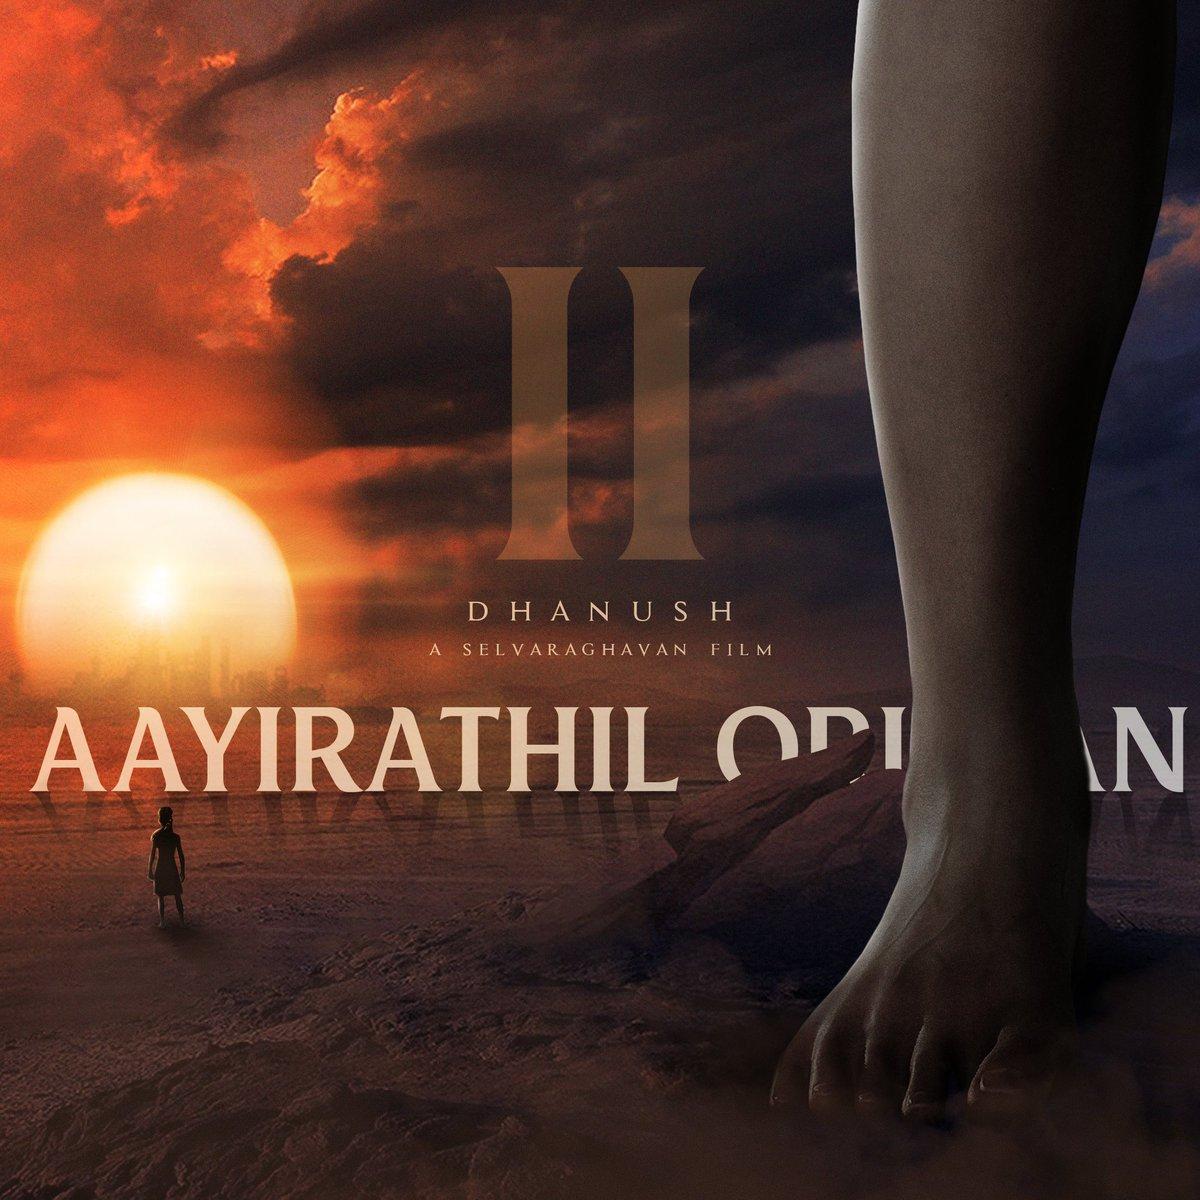 Replying to @SSMusicTweet: #AO2 Fan-made poster for #aayirathiloruvan2 !!   @selvaraghavan @dhanushkraja